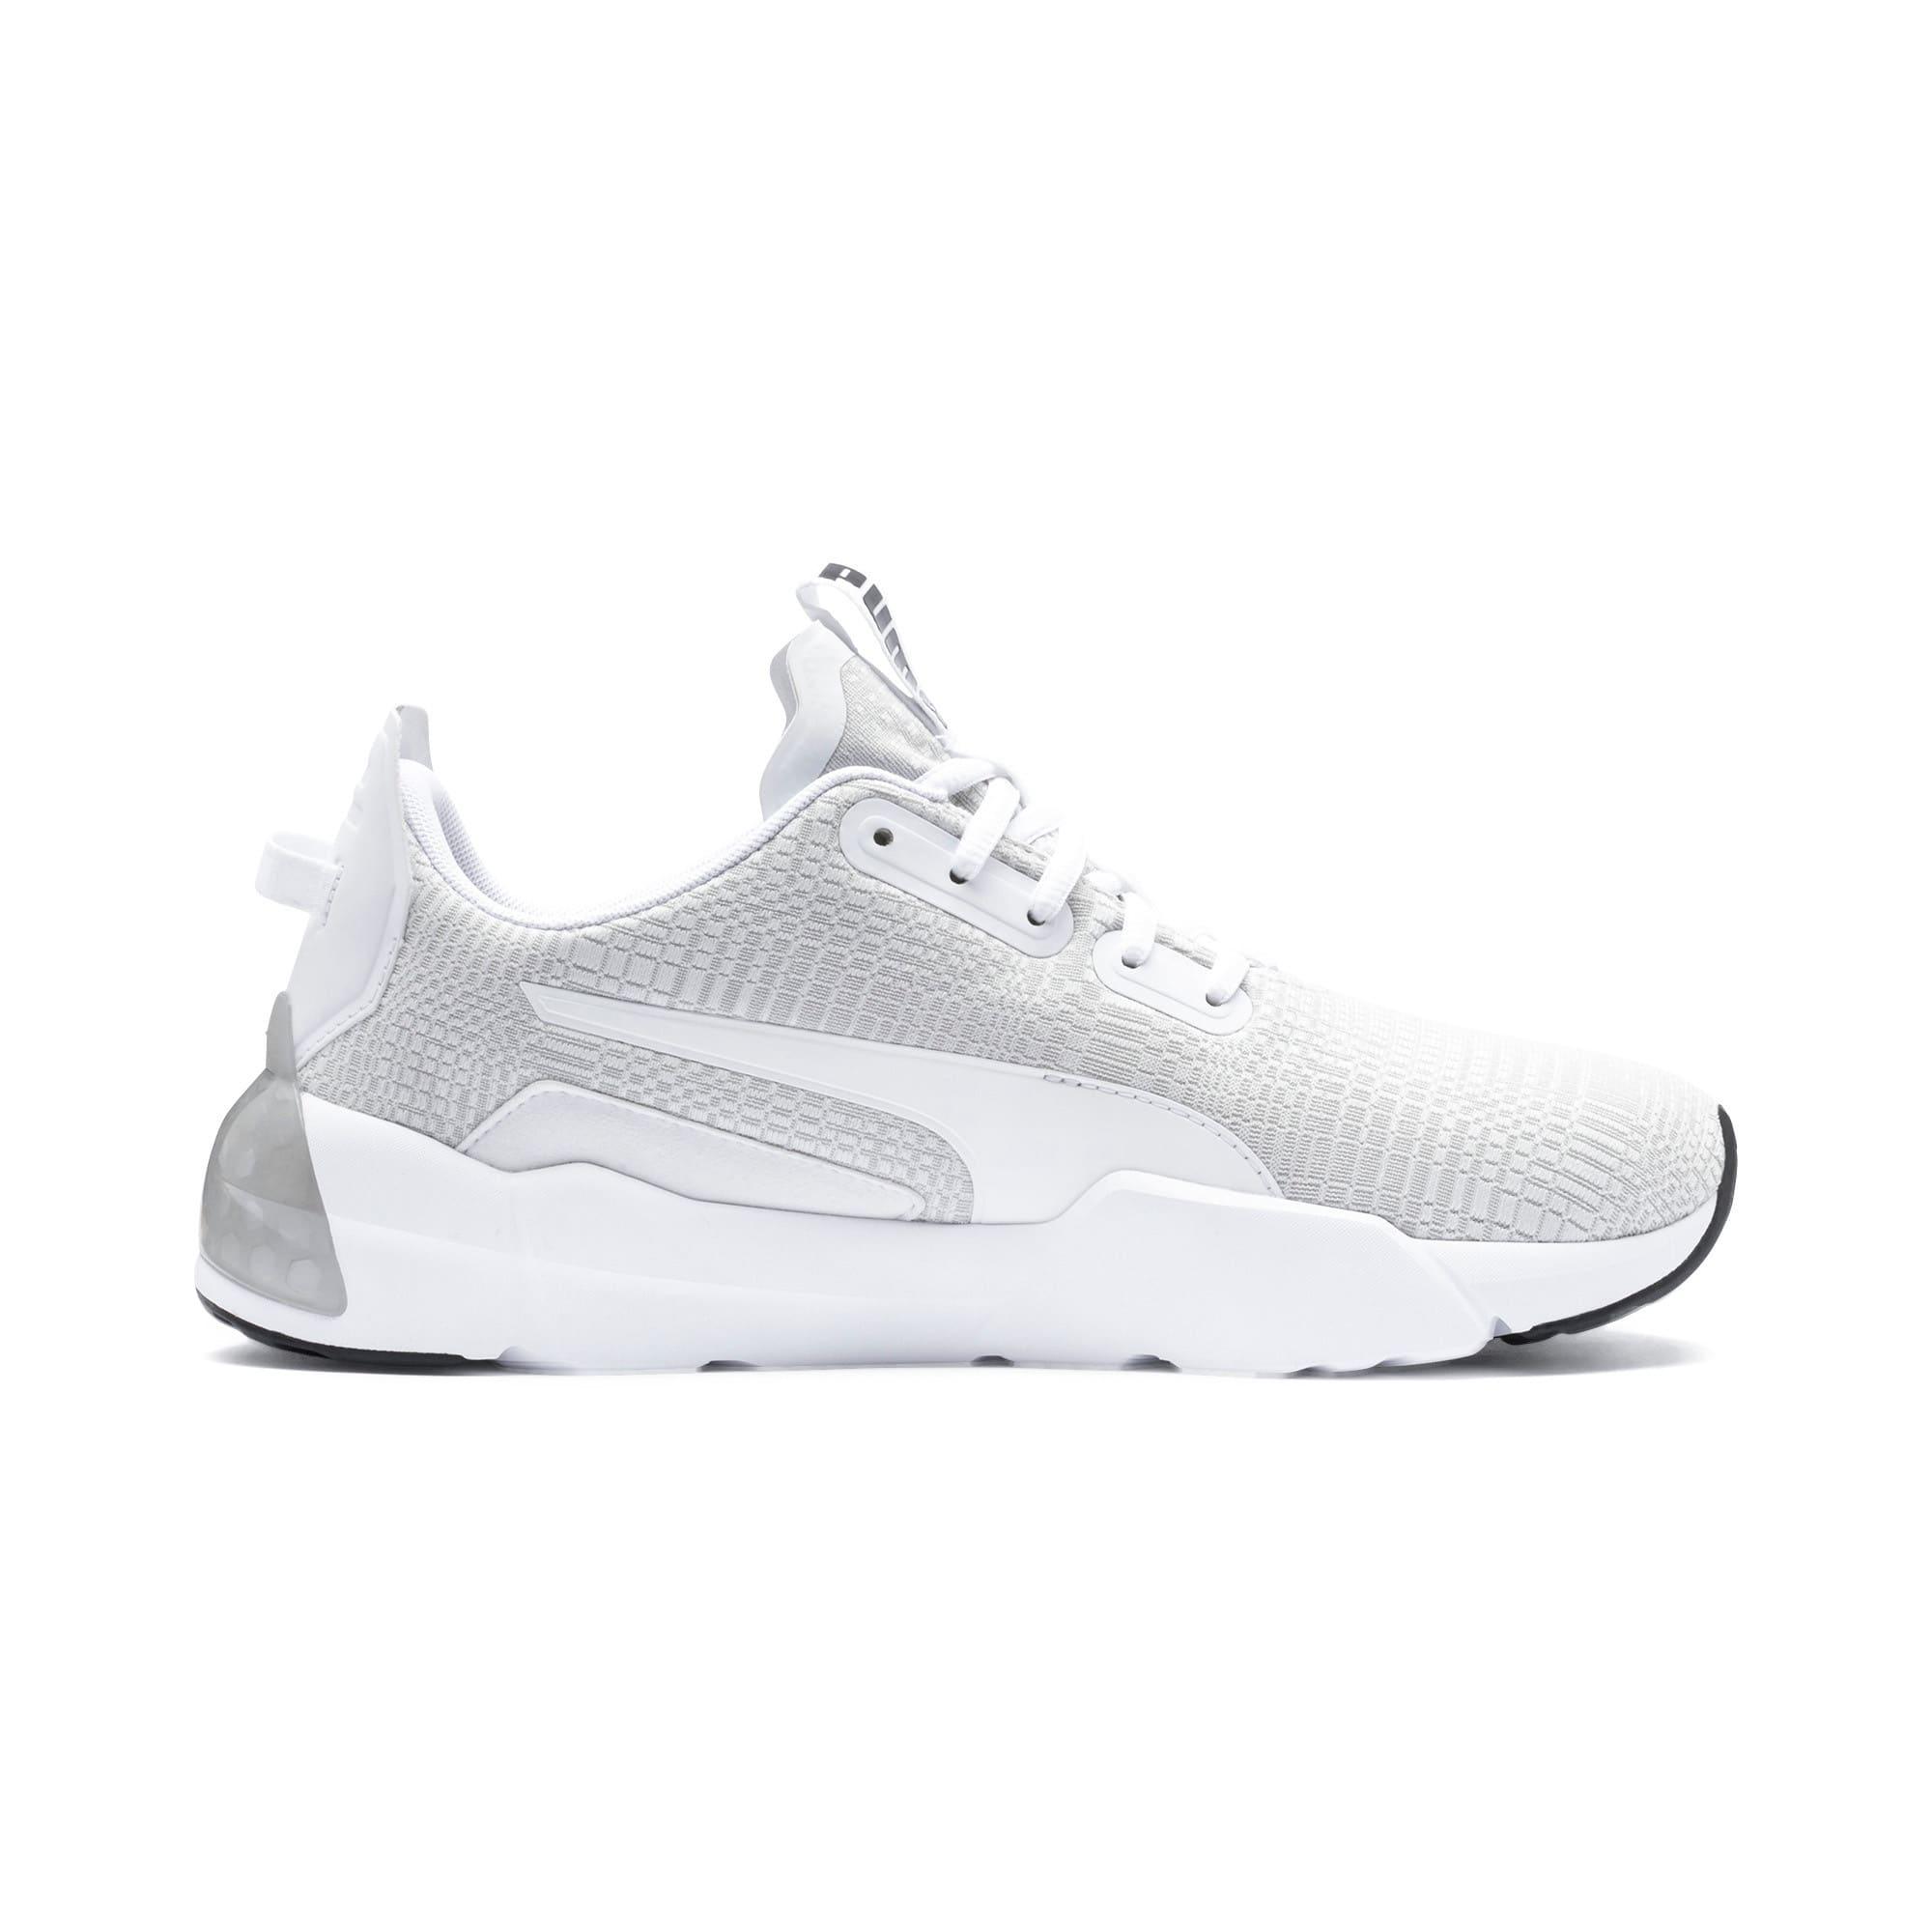 Thumbnail 6 of CELL Phase Lights Men's Running Shoes, Puma White-Gray Violet, medium